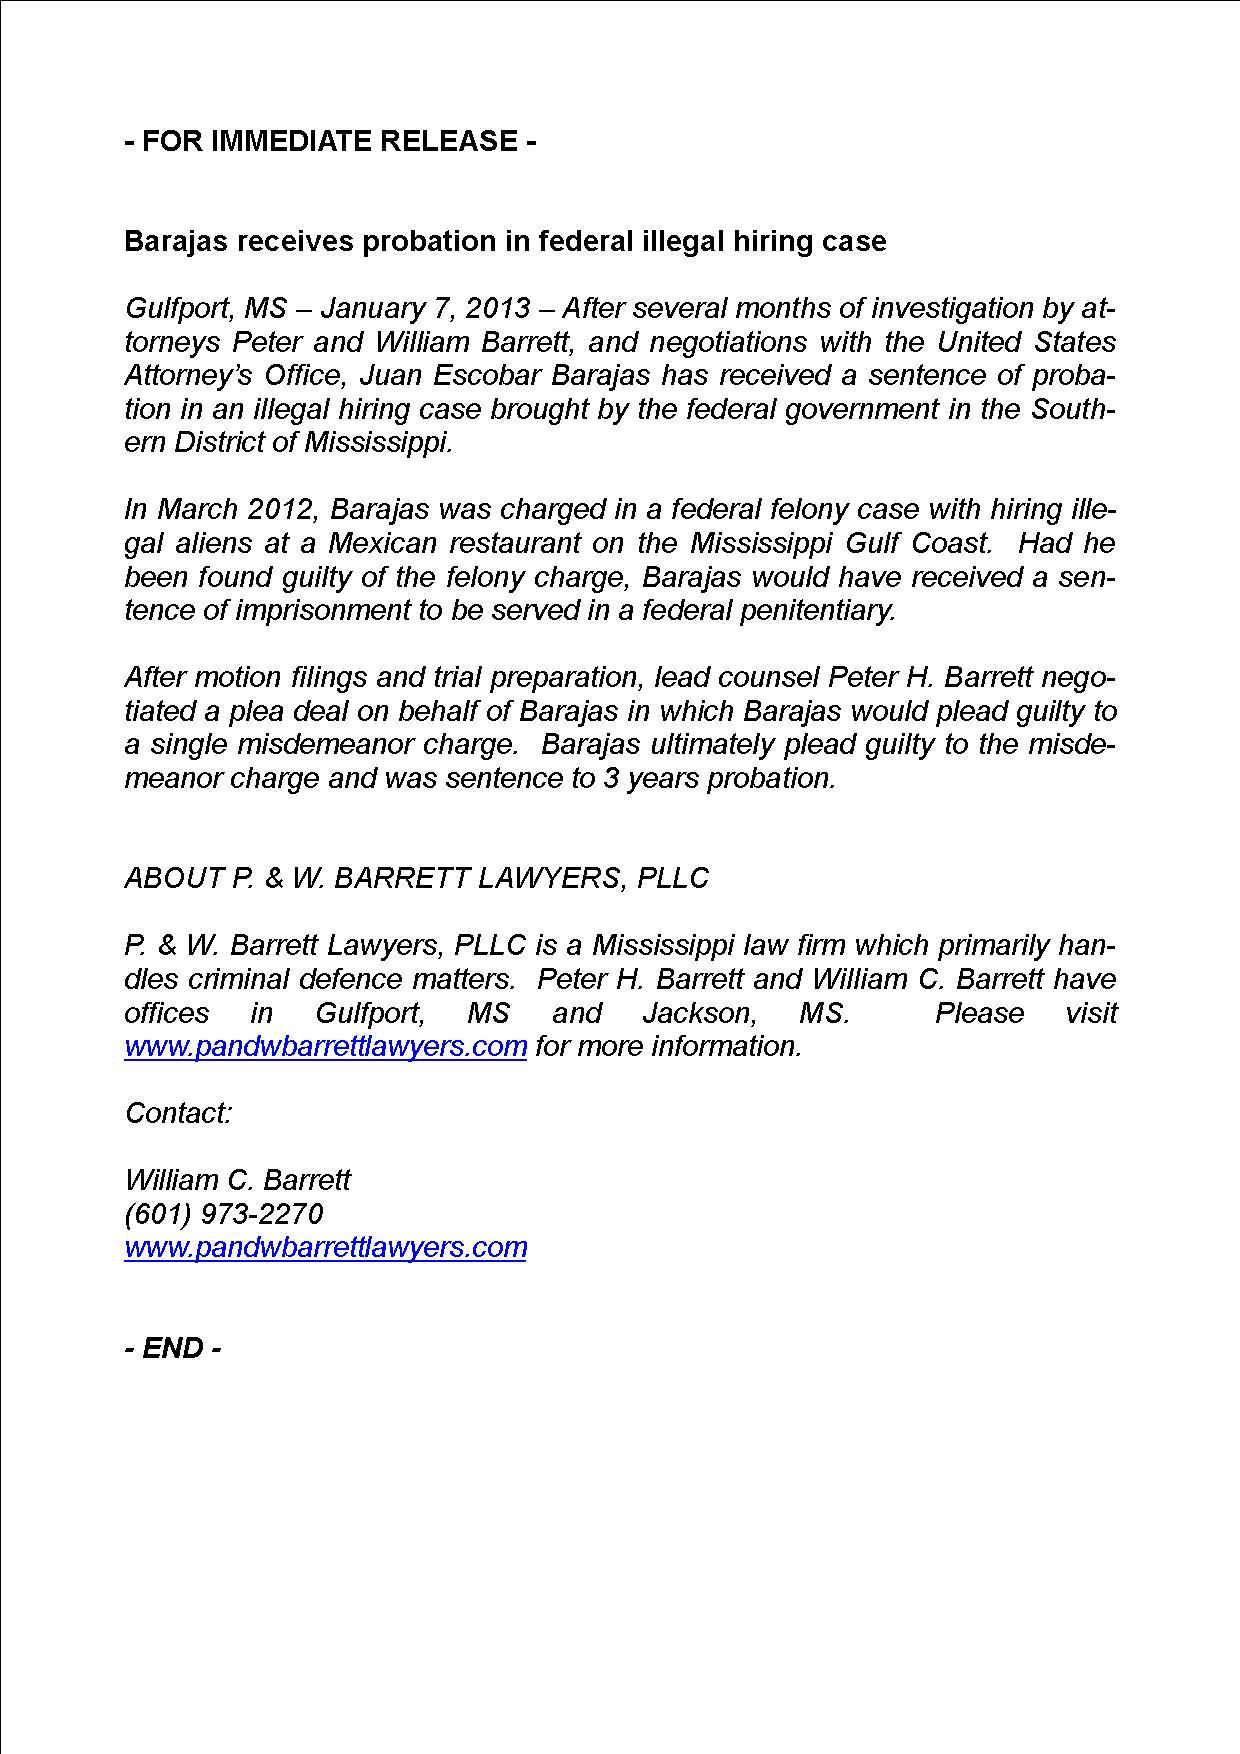 Barajas receives probation in federal illegal hiring case